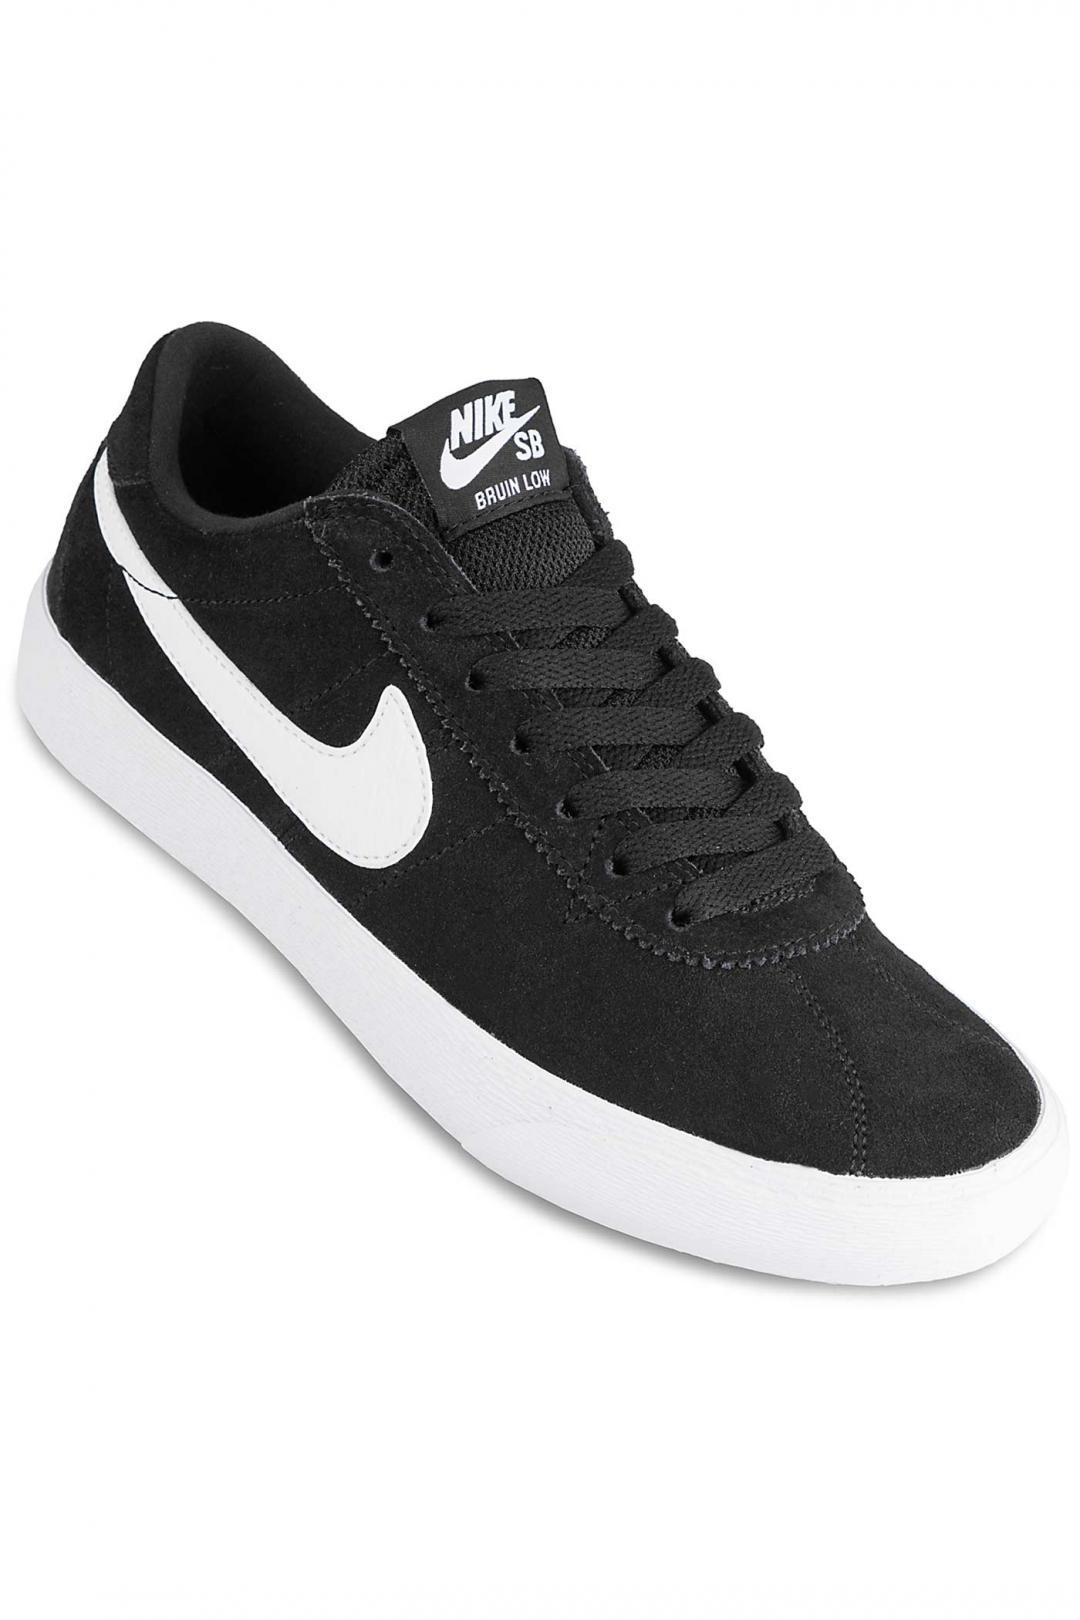 Donna Nike SB Bruin Lo black white | Sneaker